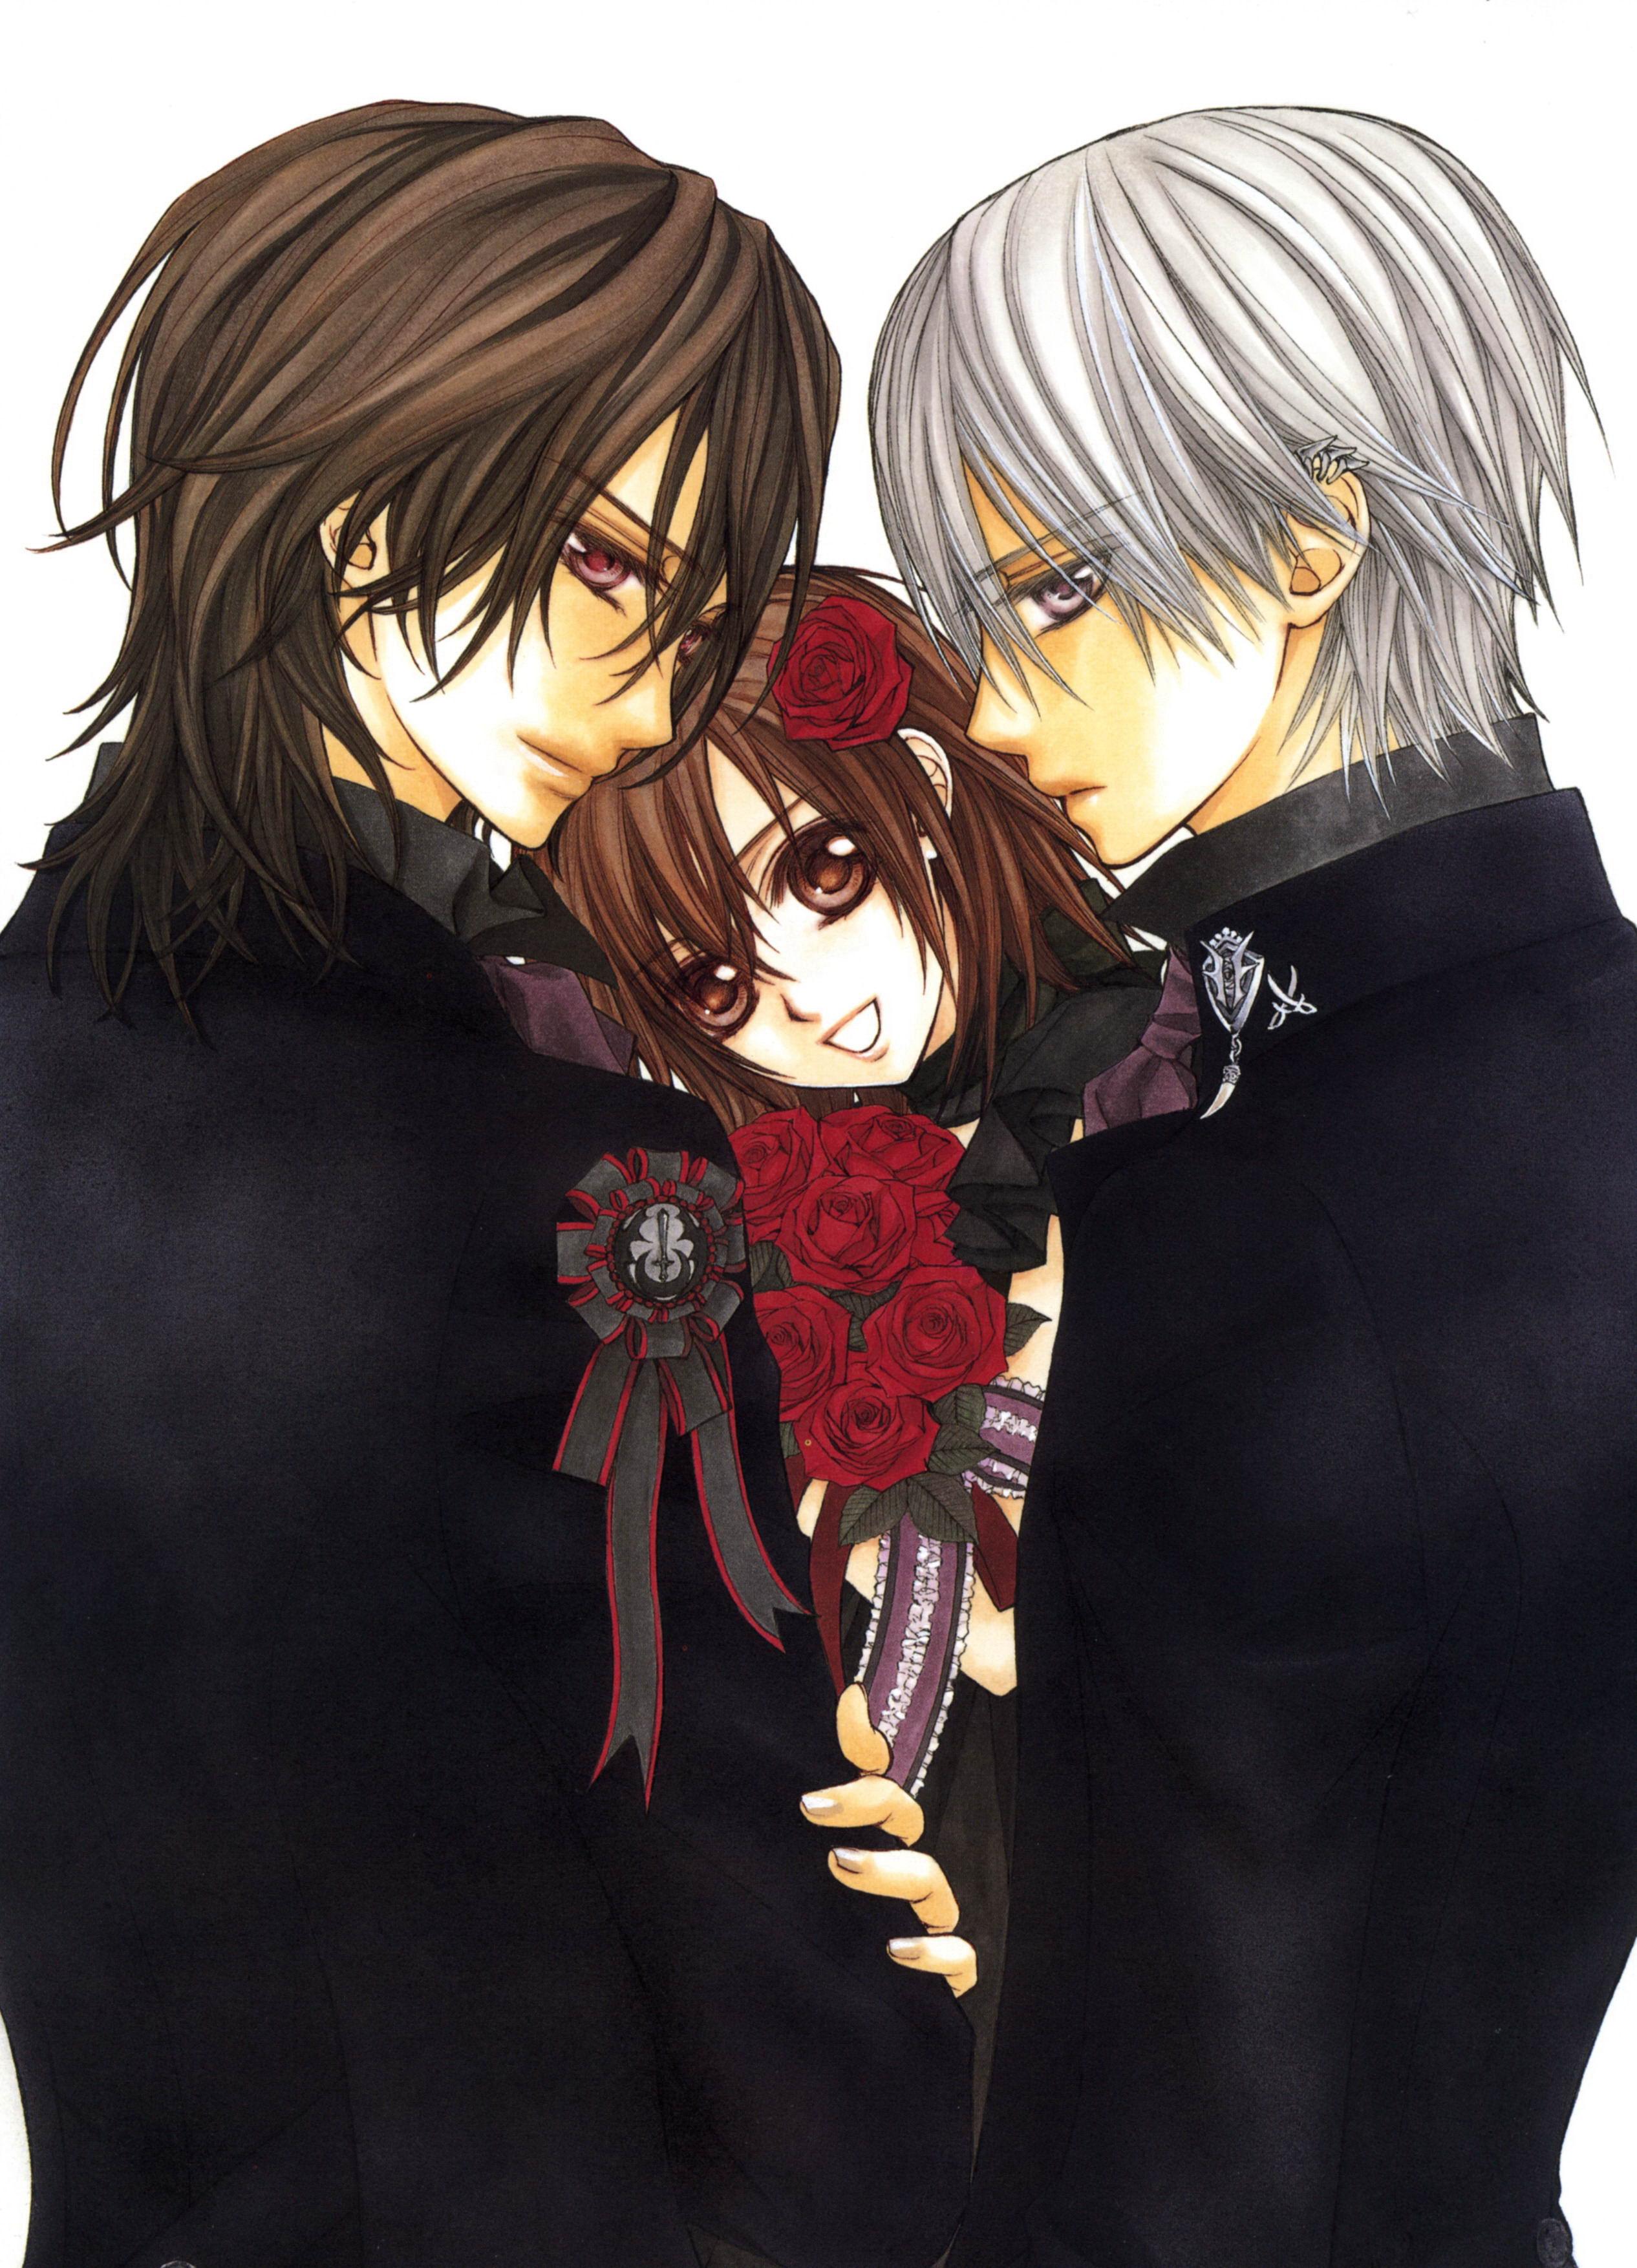 vampire love Anime knight